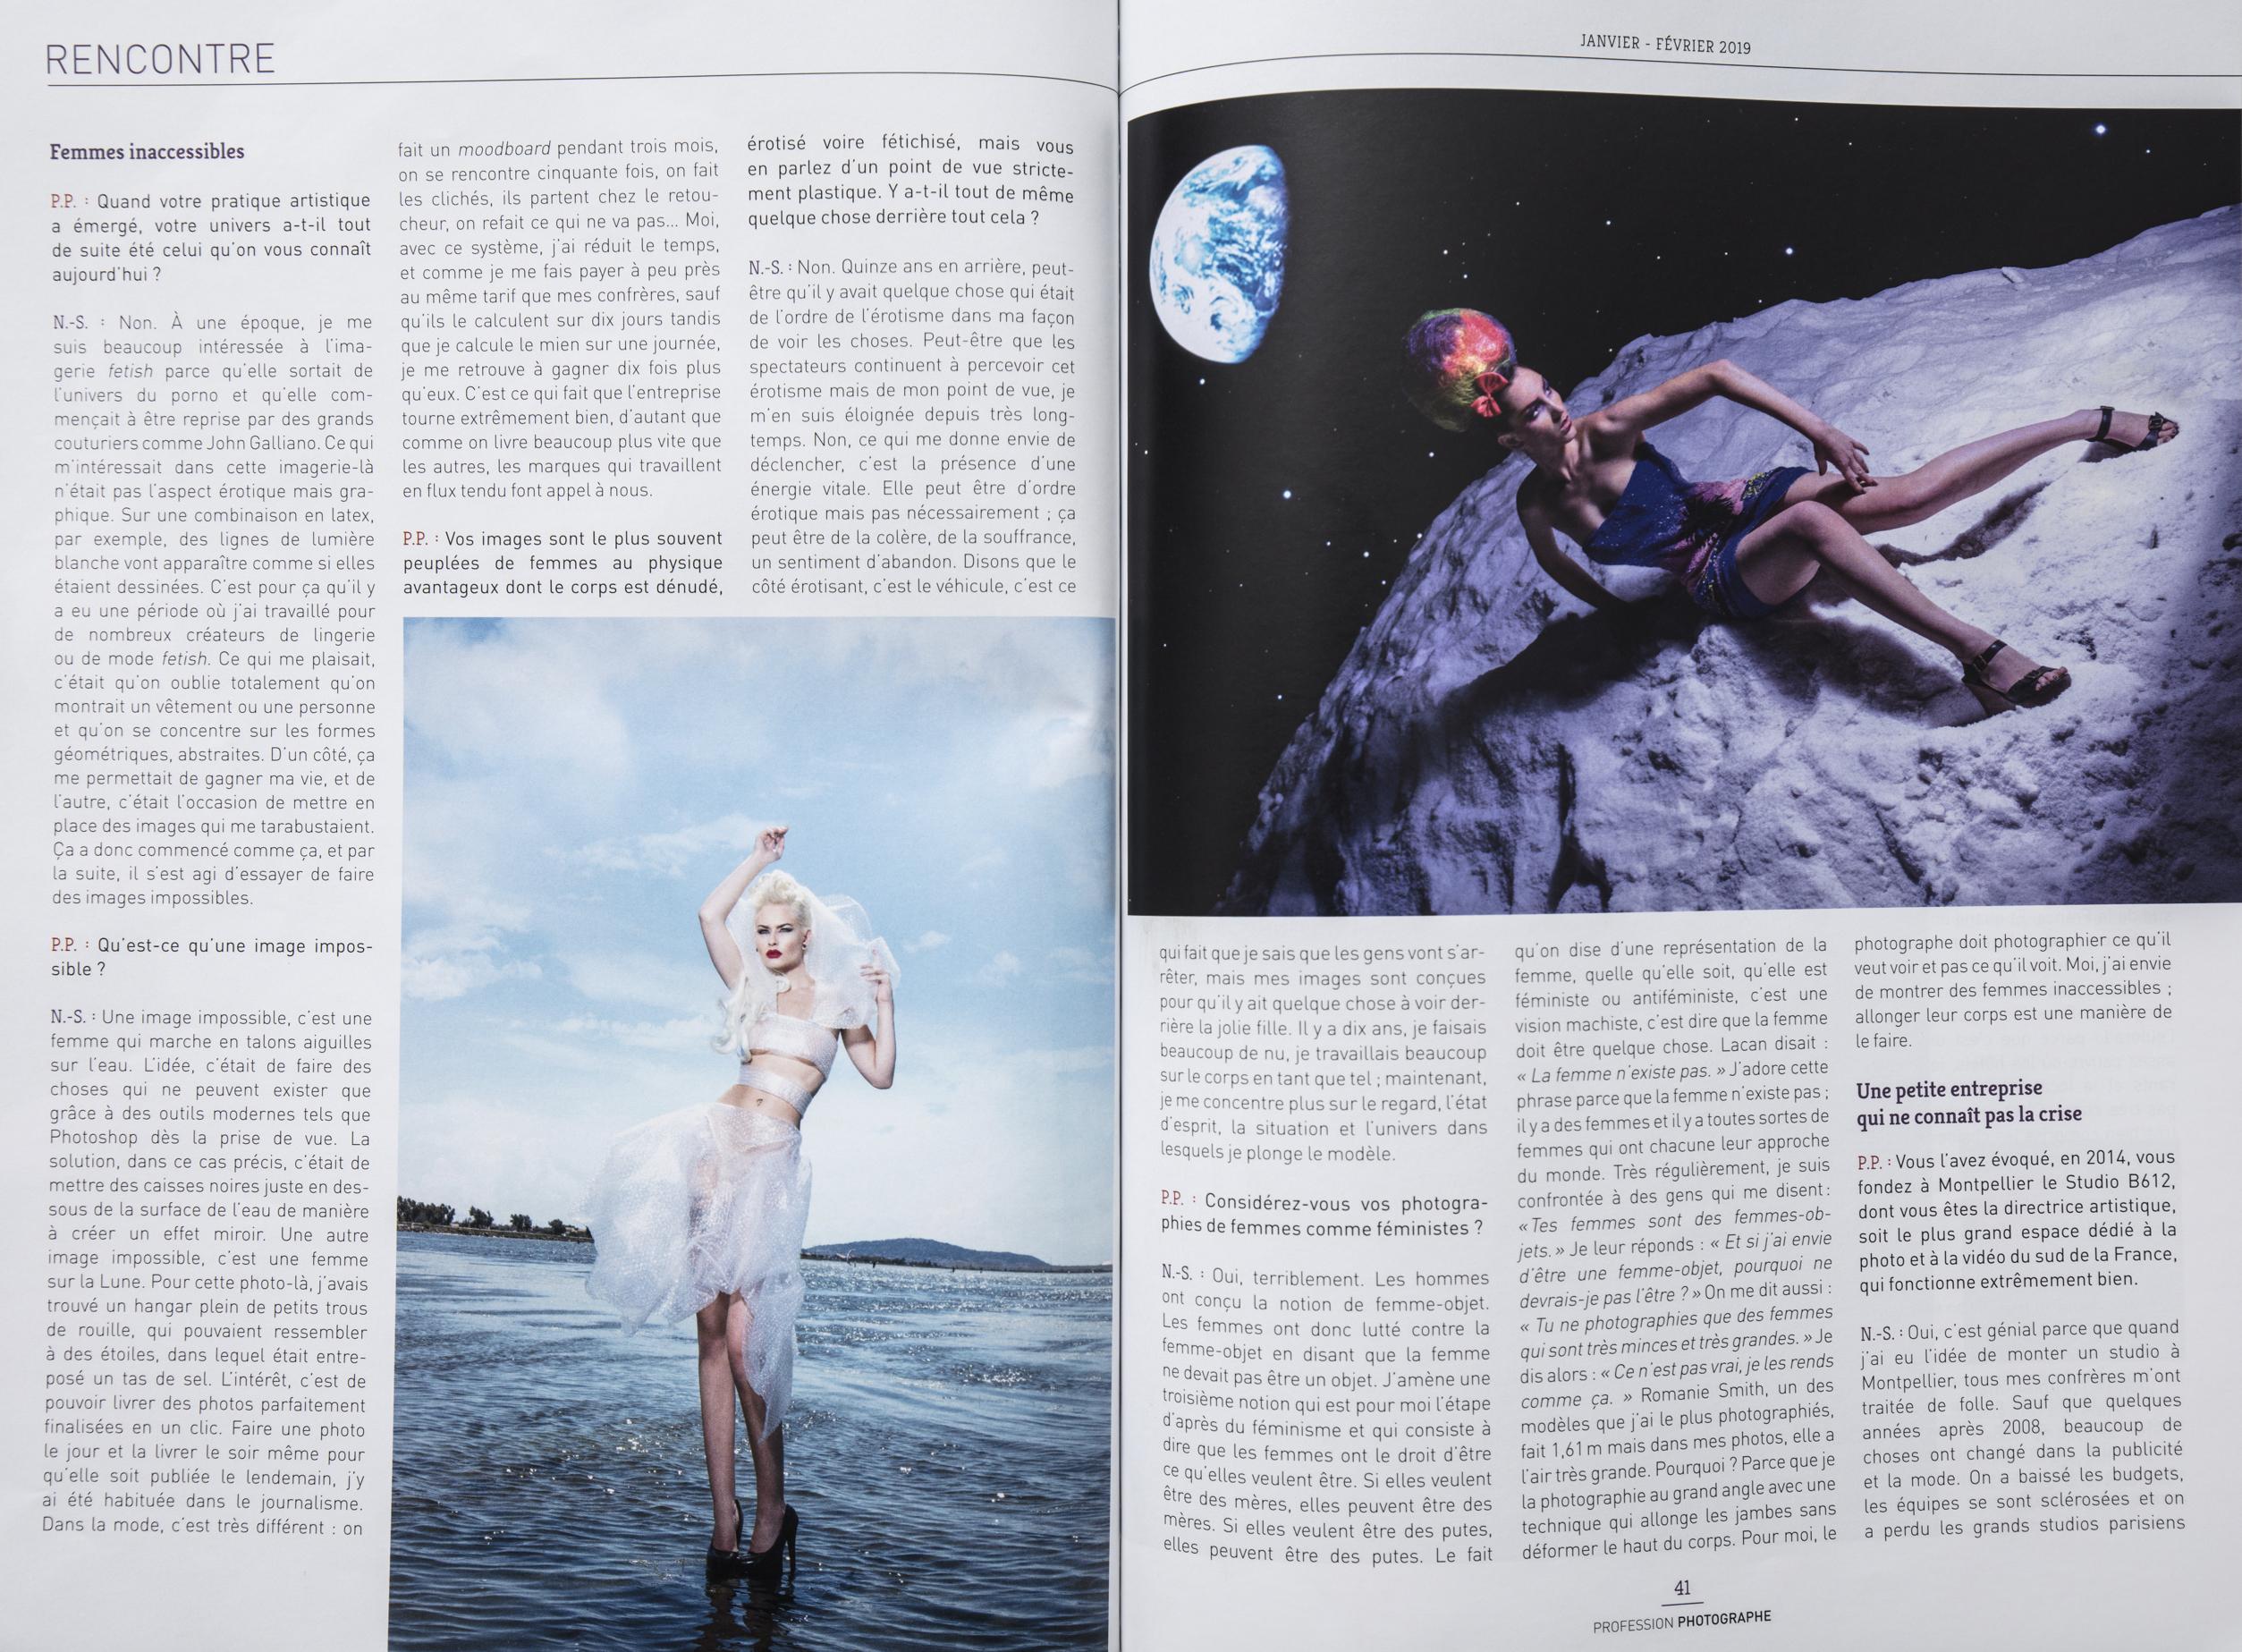 Interview de Nath-Sakura dans Profession photographe